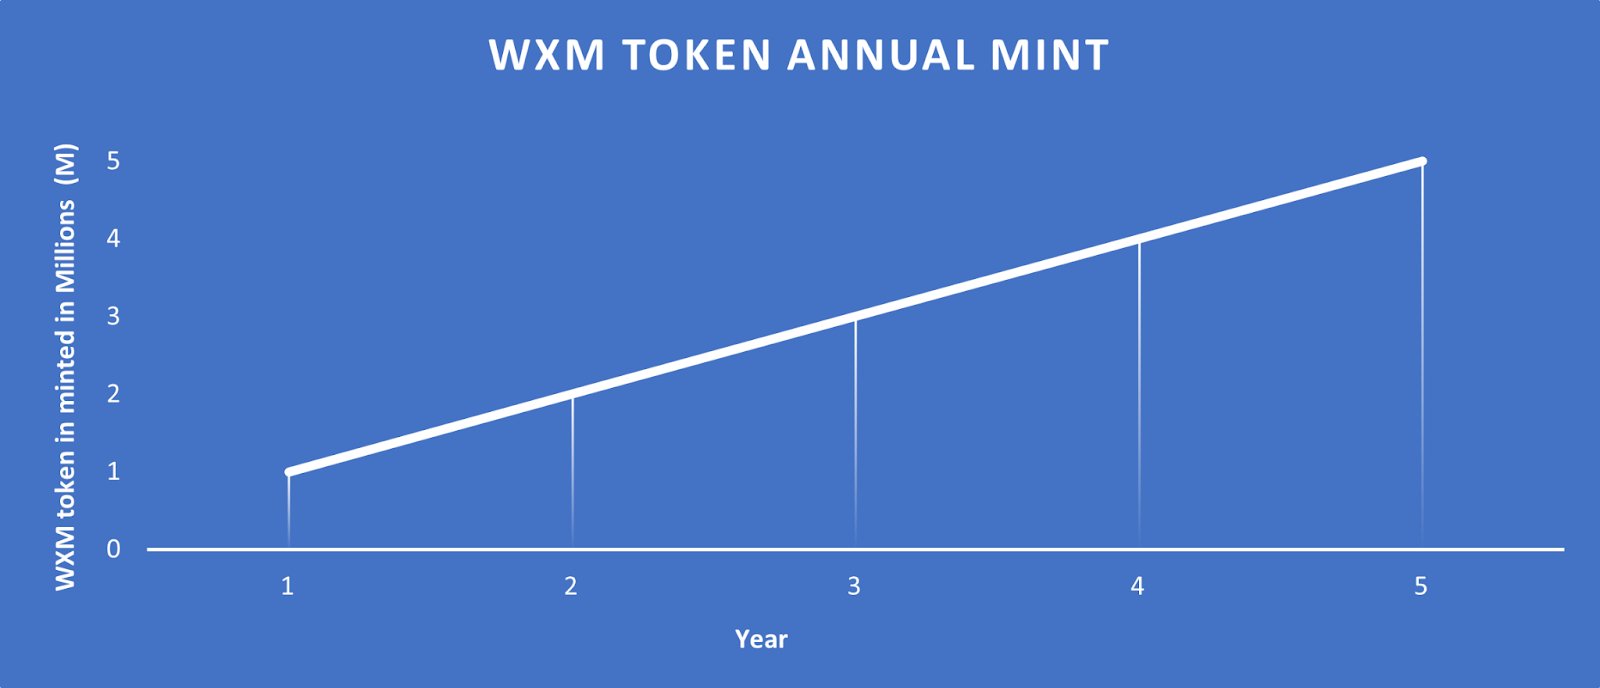 WXM Token Annual Mint